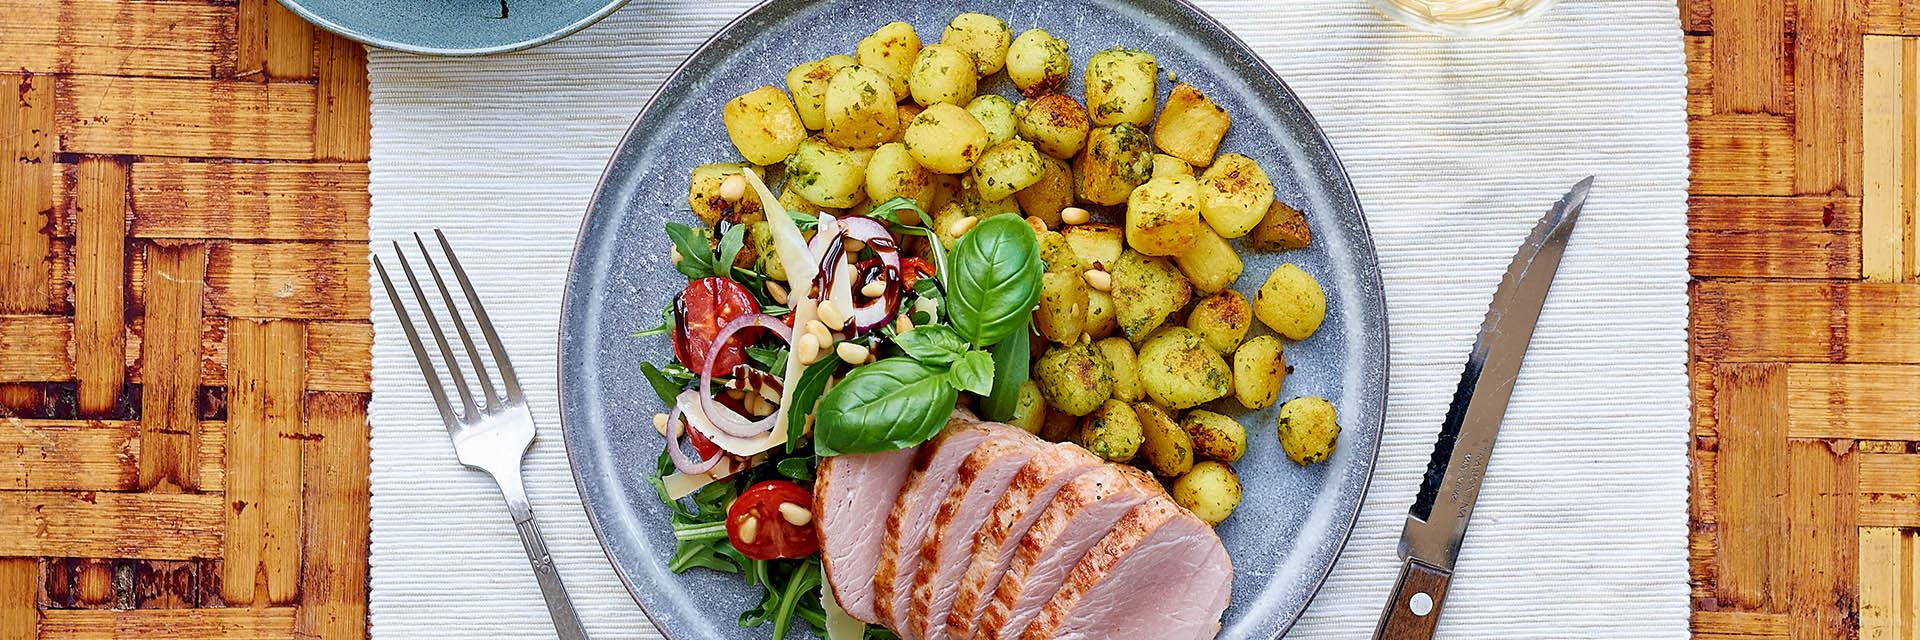 Varkenshaast met Mini Krieltjes in pesto en frisse salade